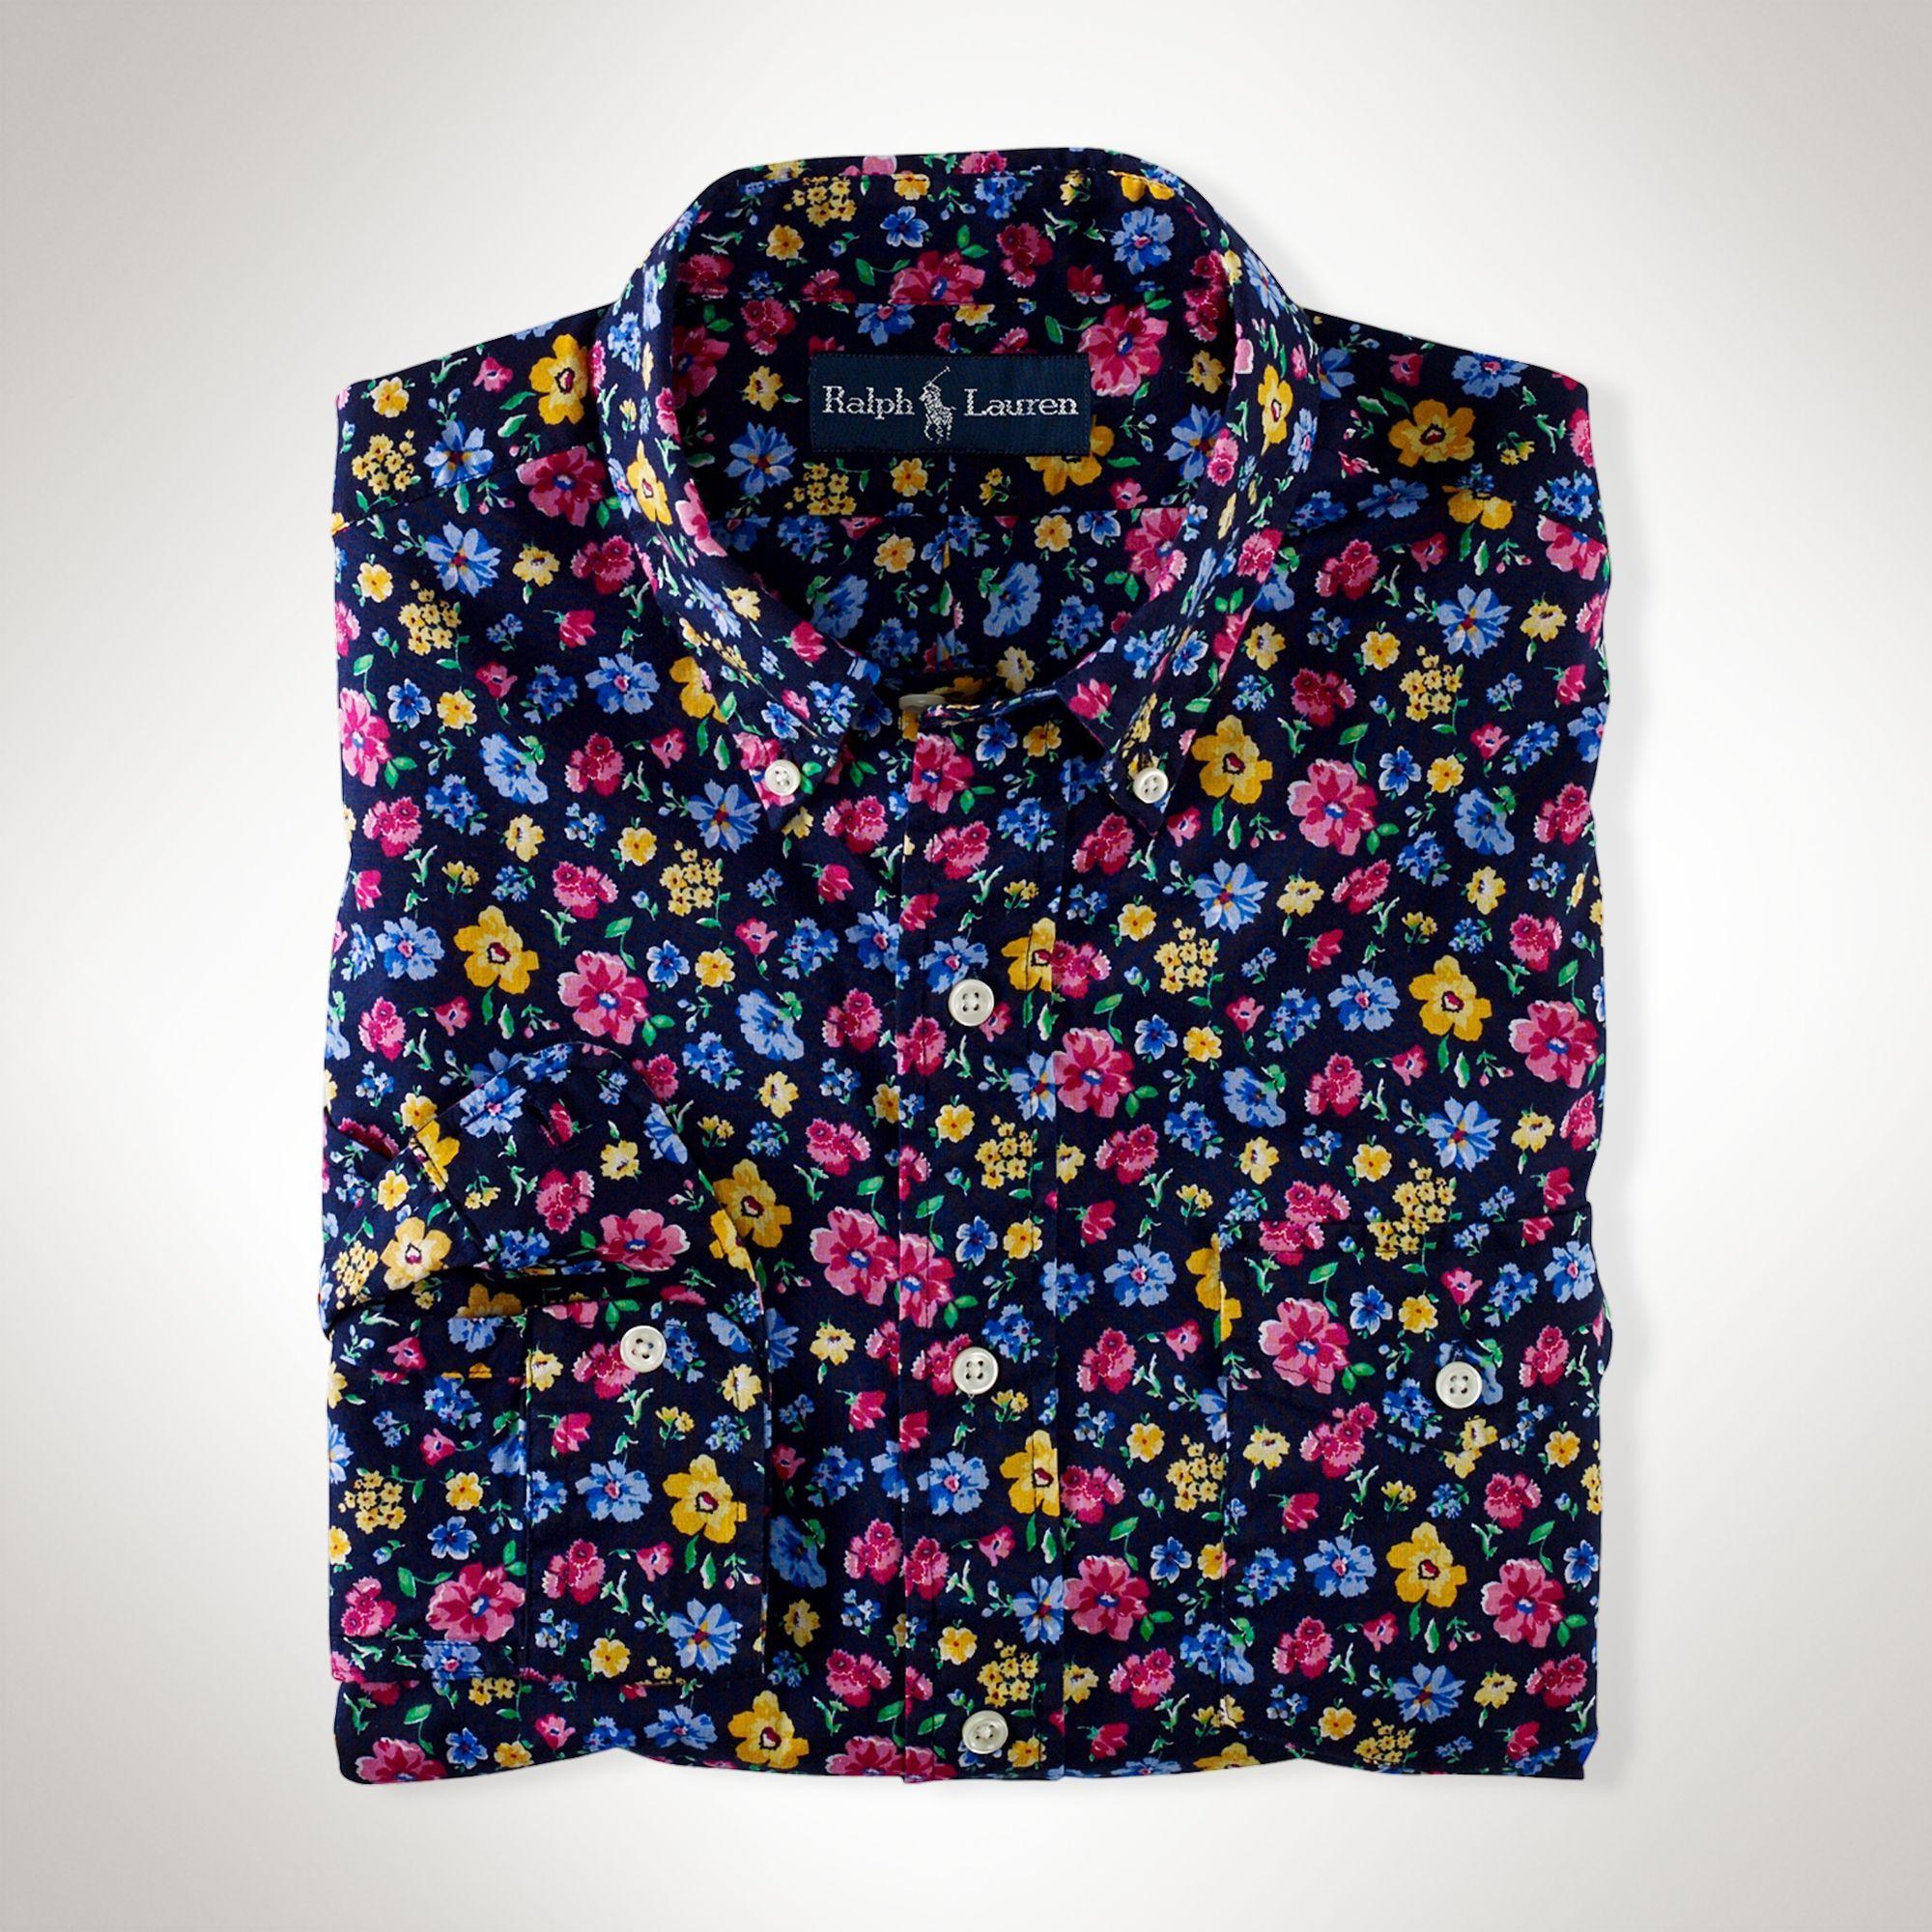 Polo Ralph Lauren Sporthemd Chillmark Floral